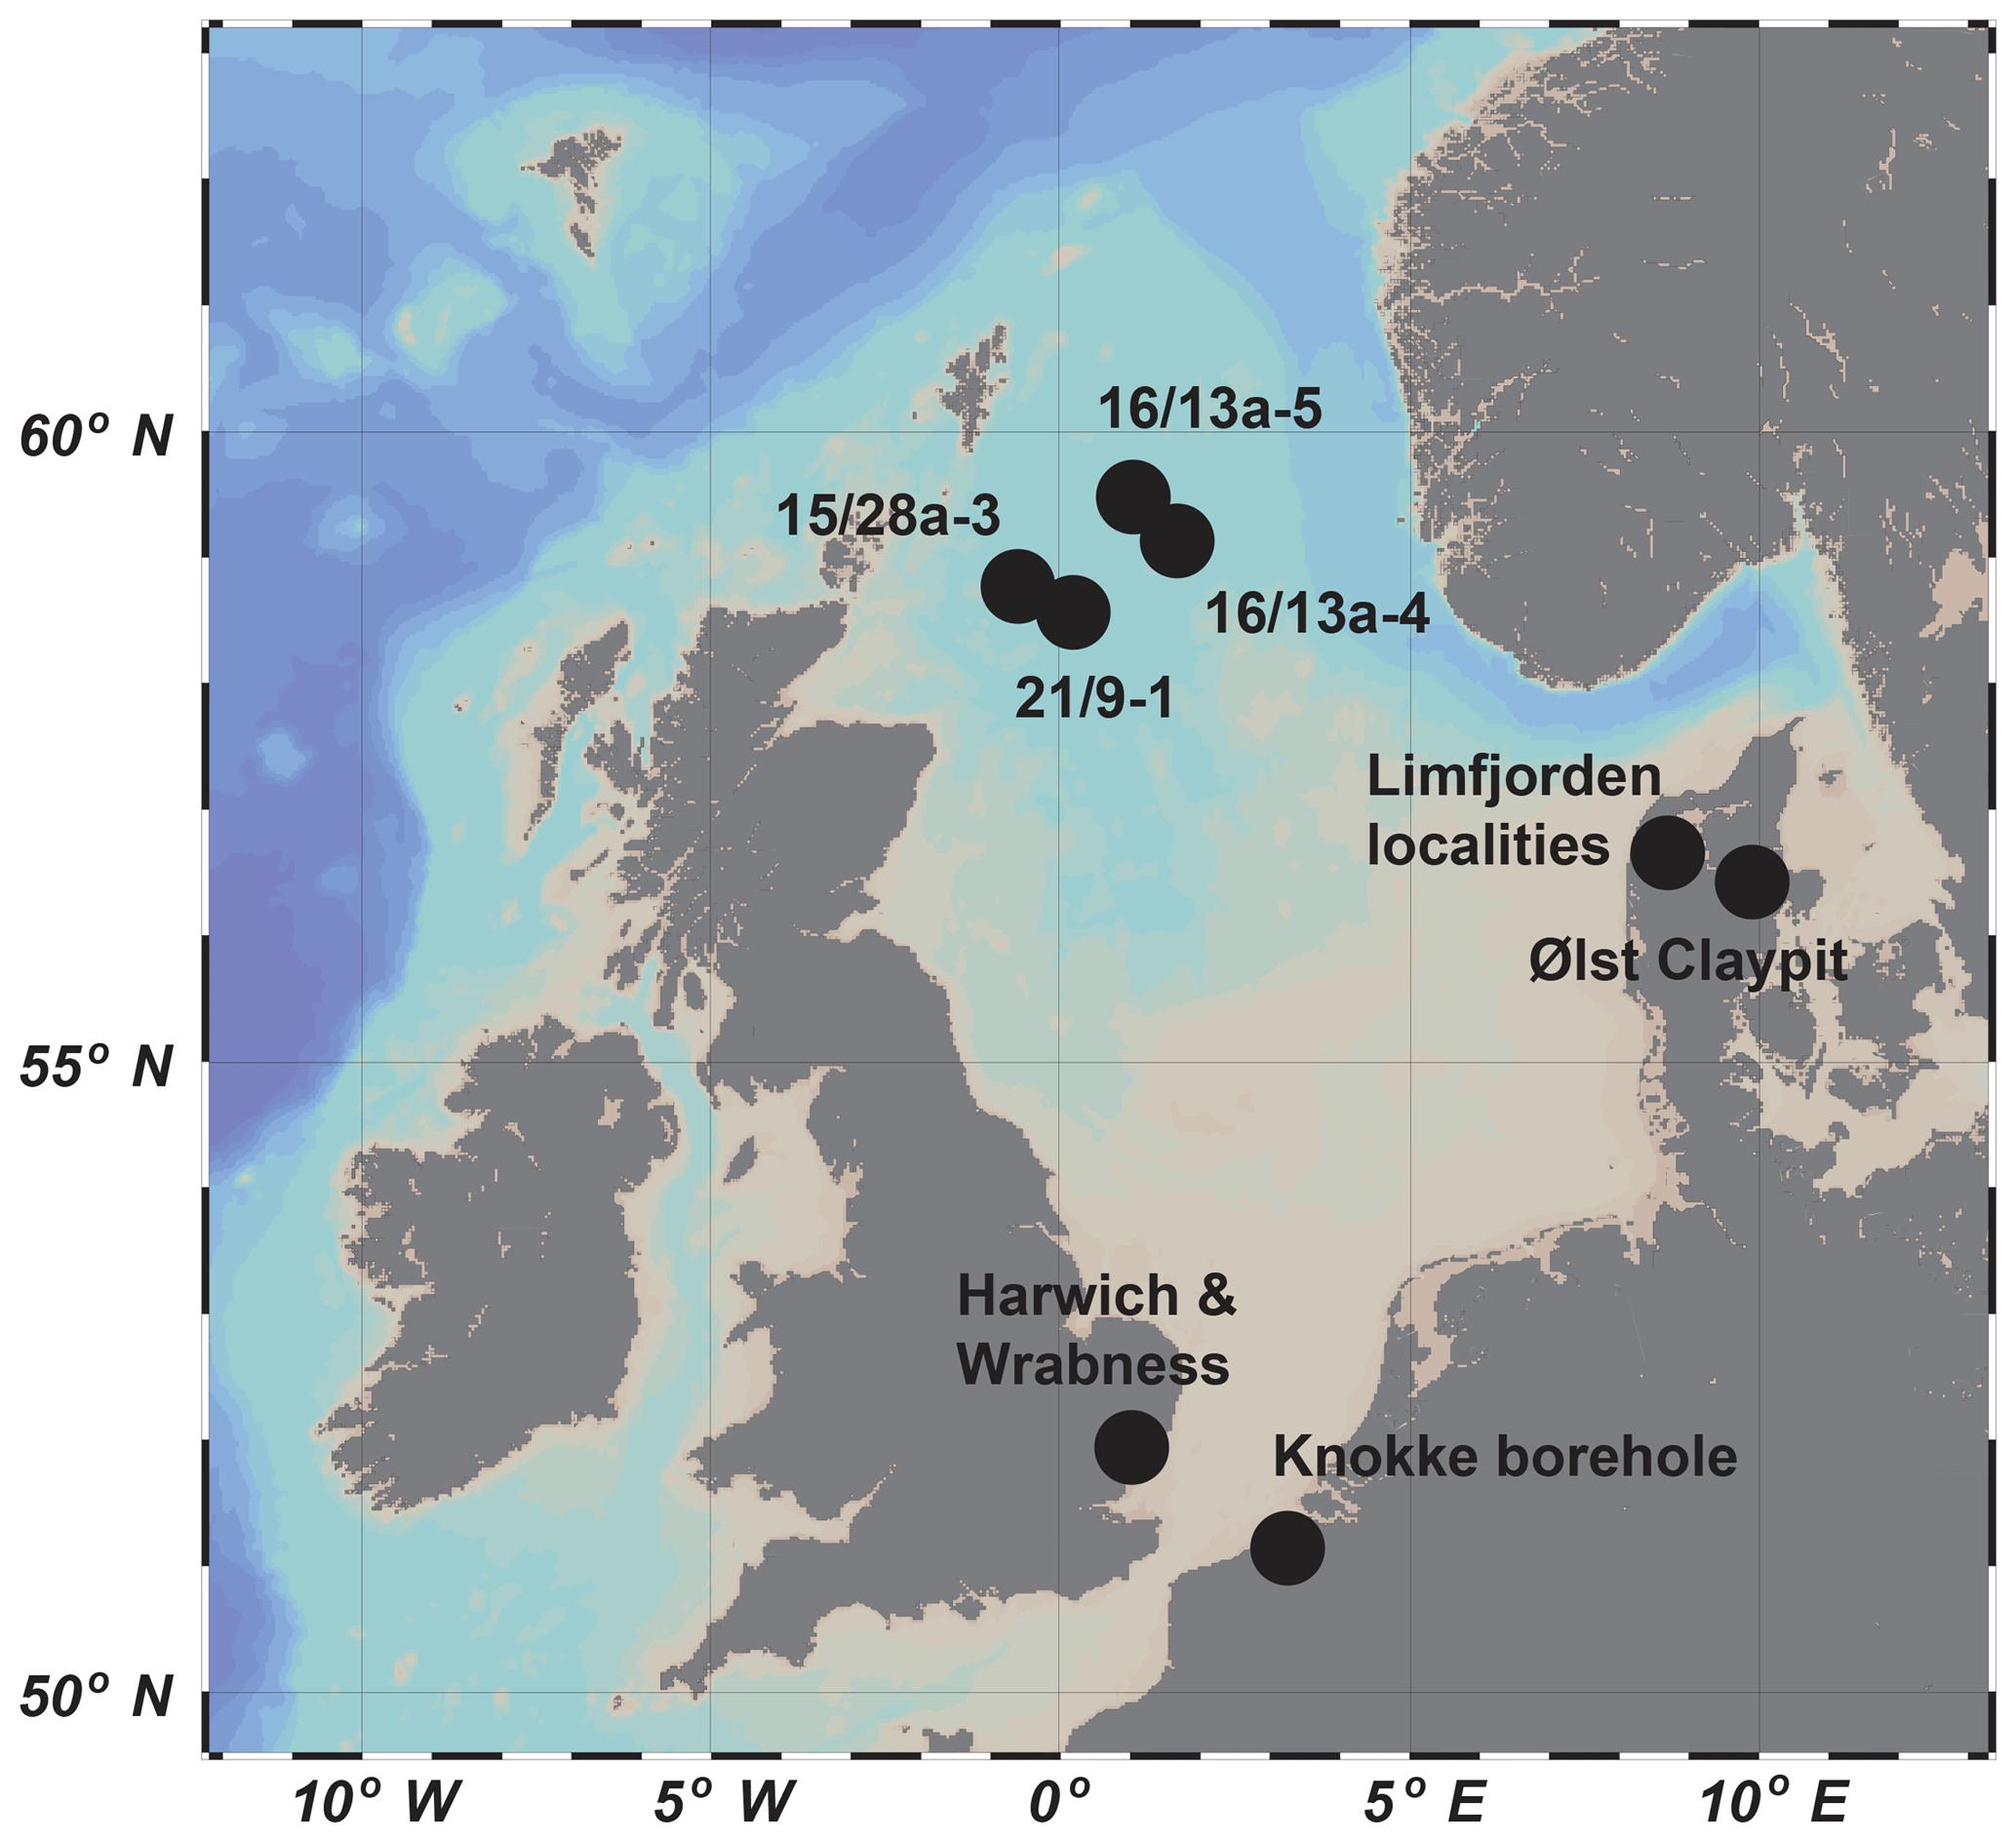 JM - Species of the diatom taxa Aulacodiscus and Trinacria